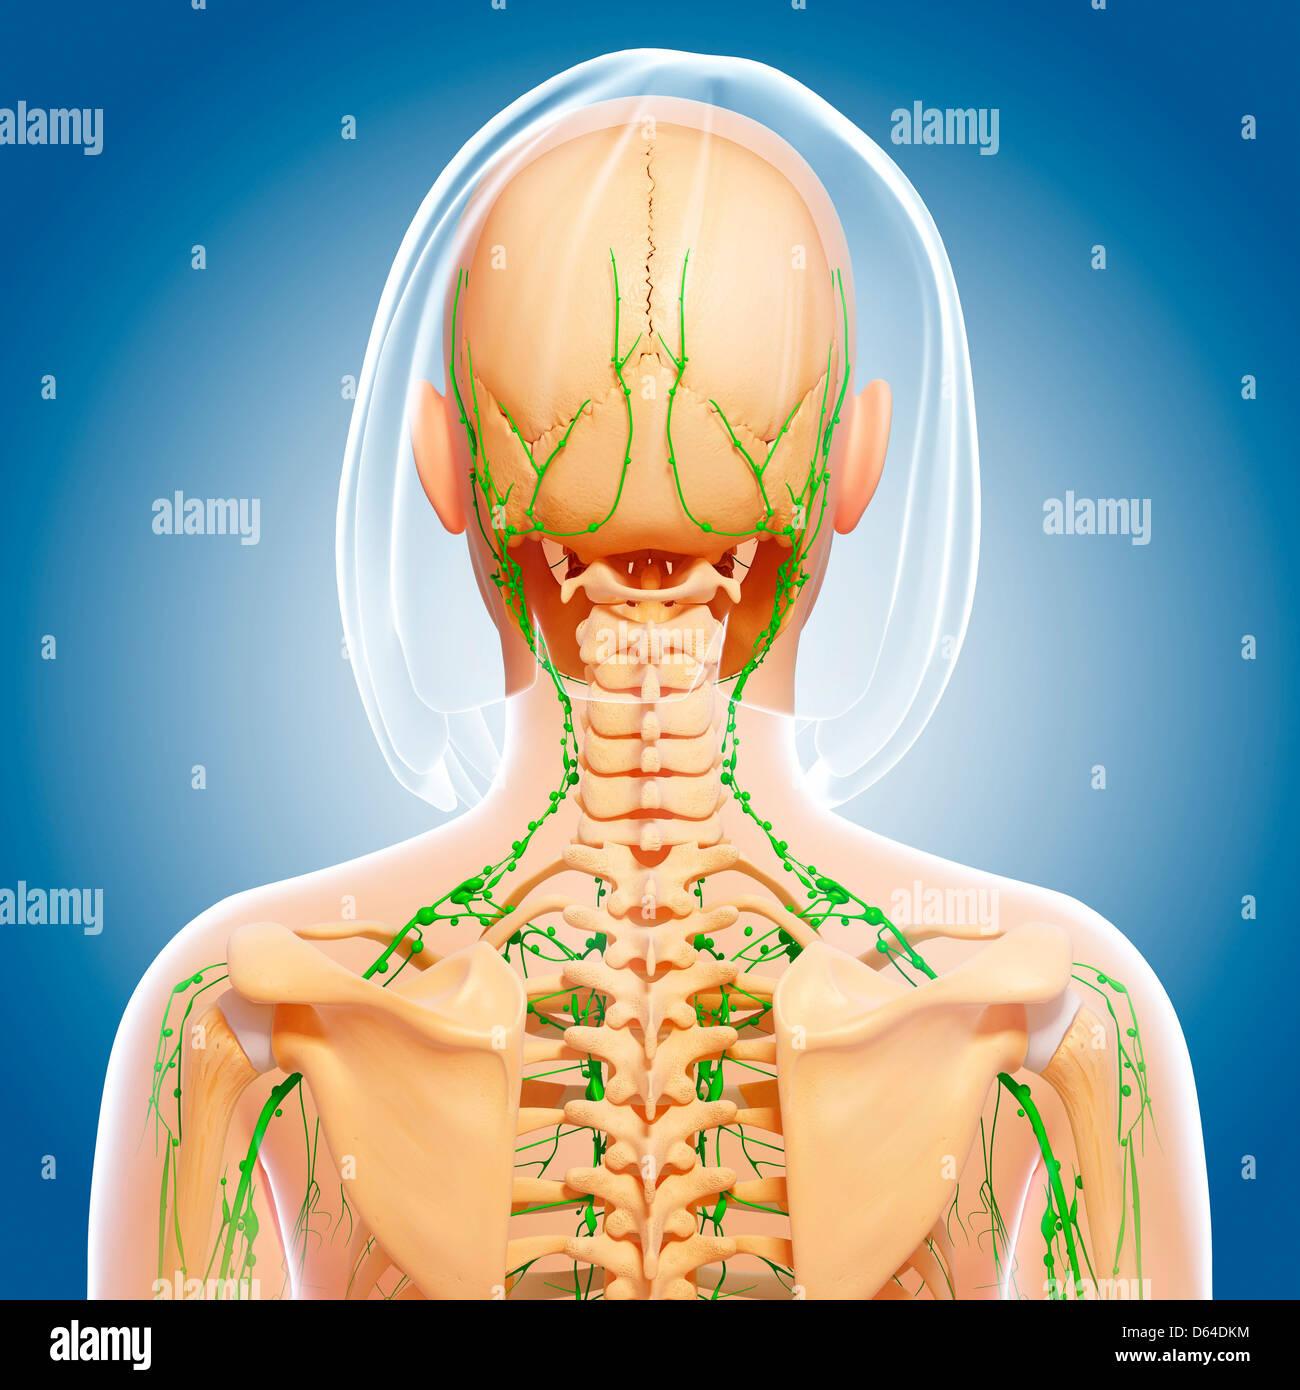 Oberkörper-Anatomie, artwork Stockfoto, Bild: 55417592 - Alamy